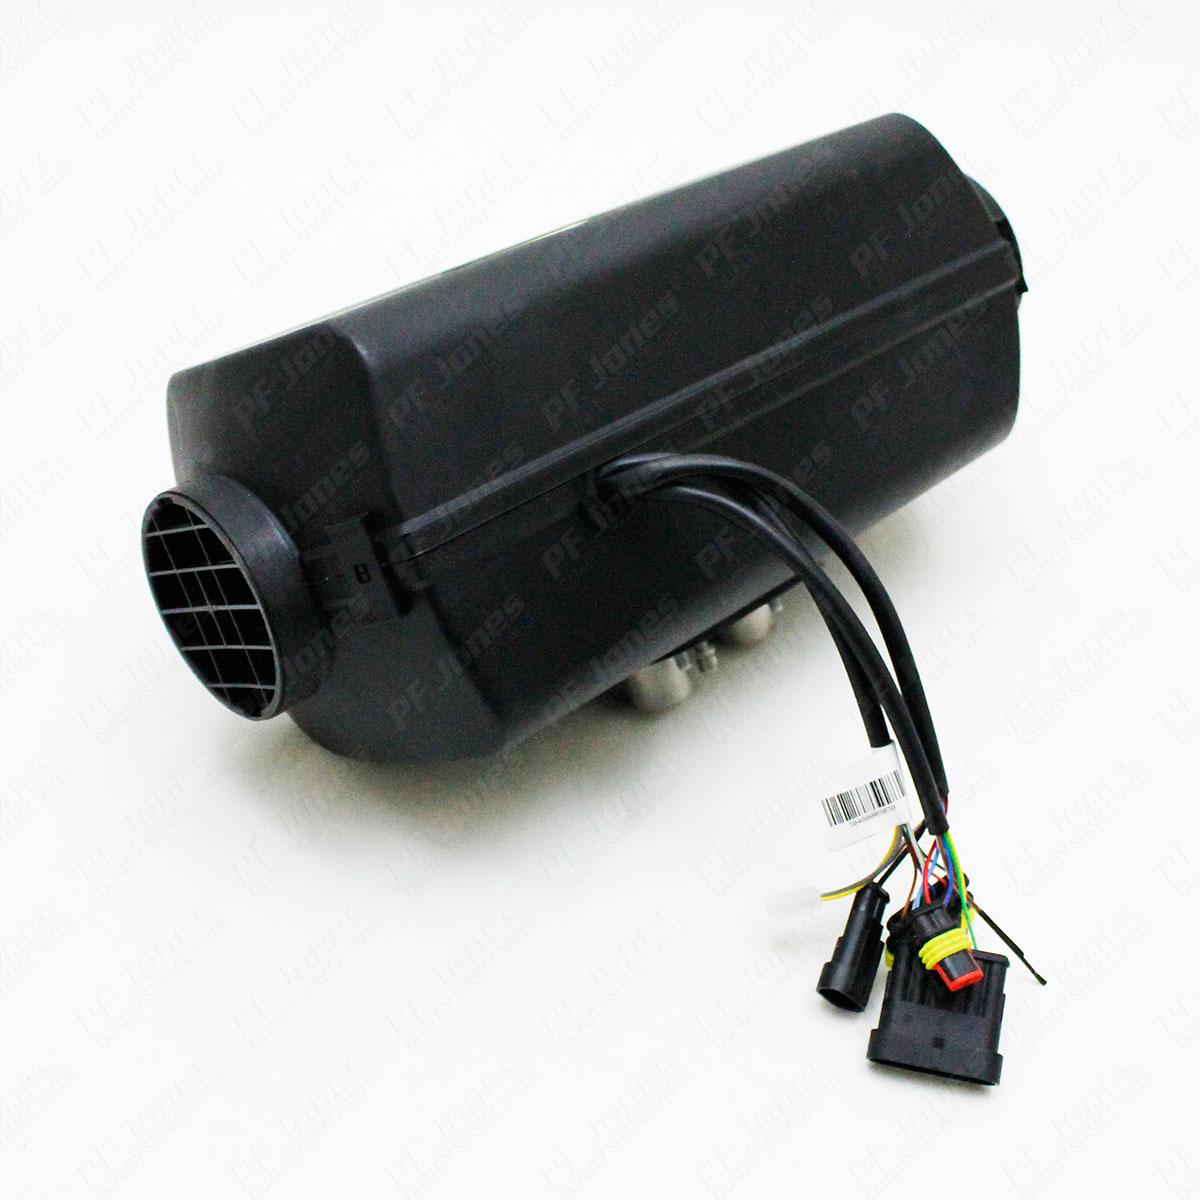 Planar Marine 44D Air Heater - 4kW/12V - Small - Basic Kit